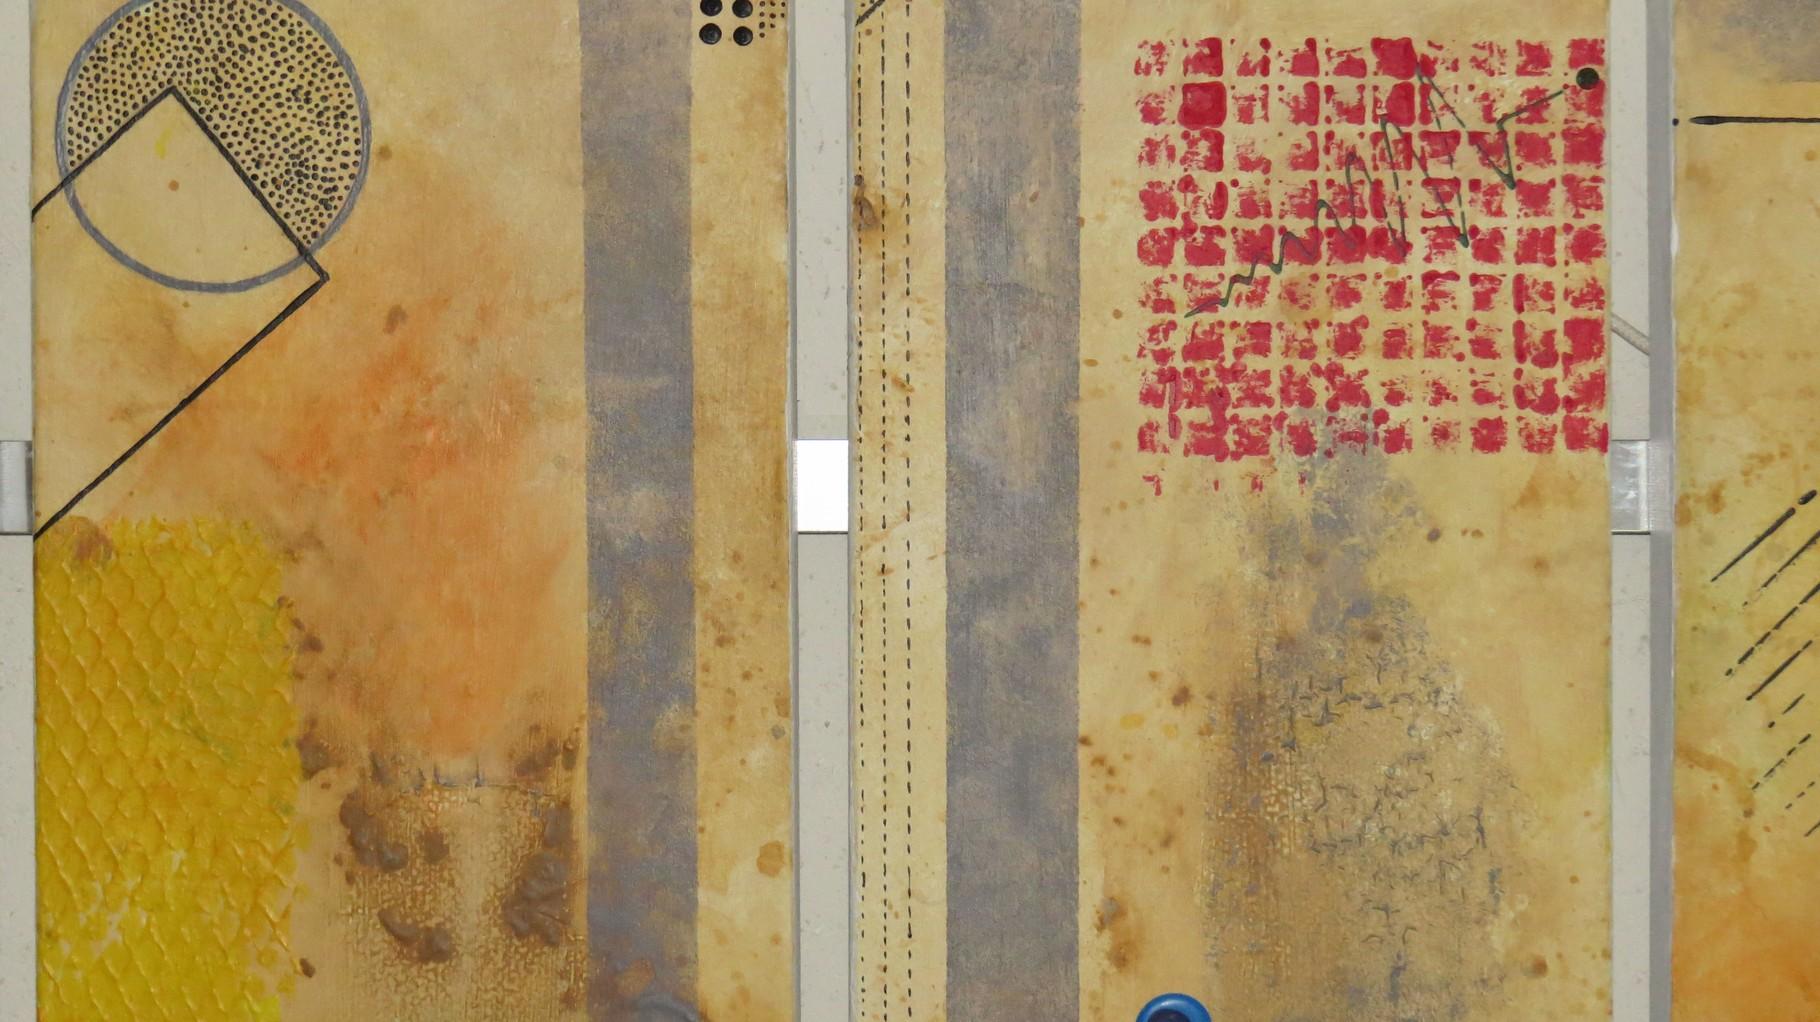 circuit imprimé zoom2 - daluz galego tableau abstrait abstraction